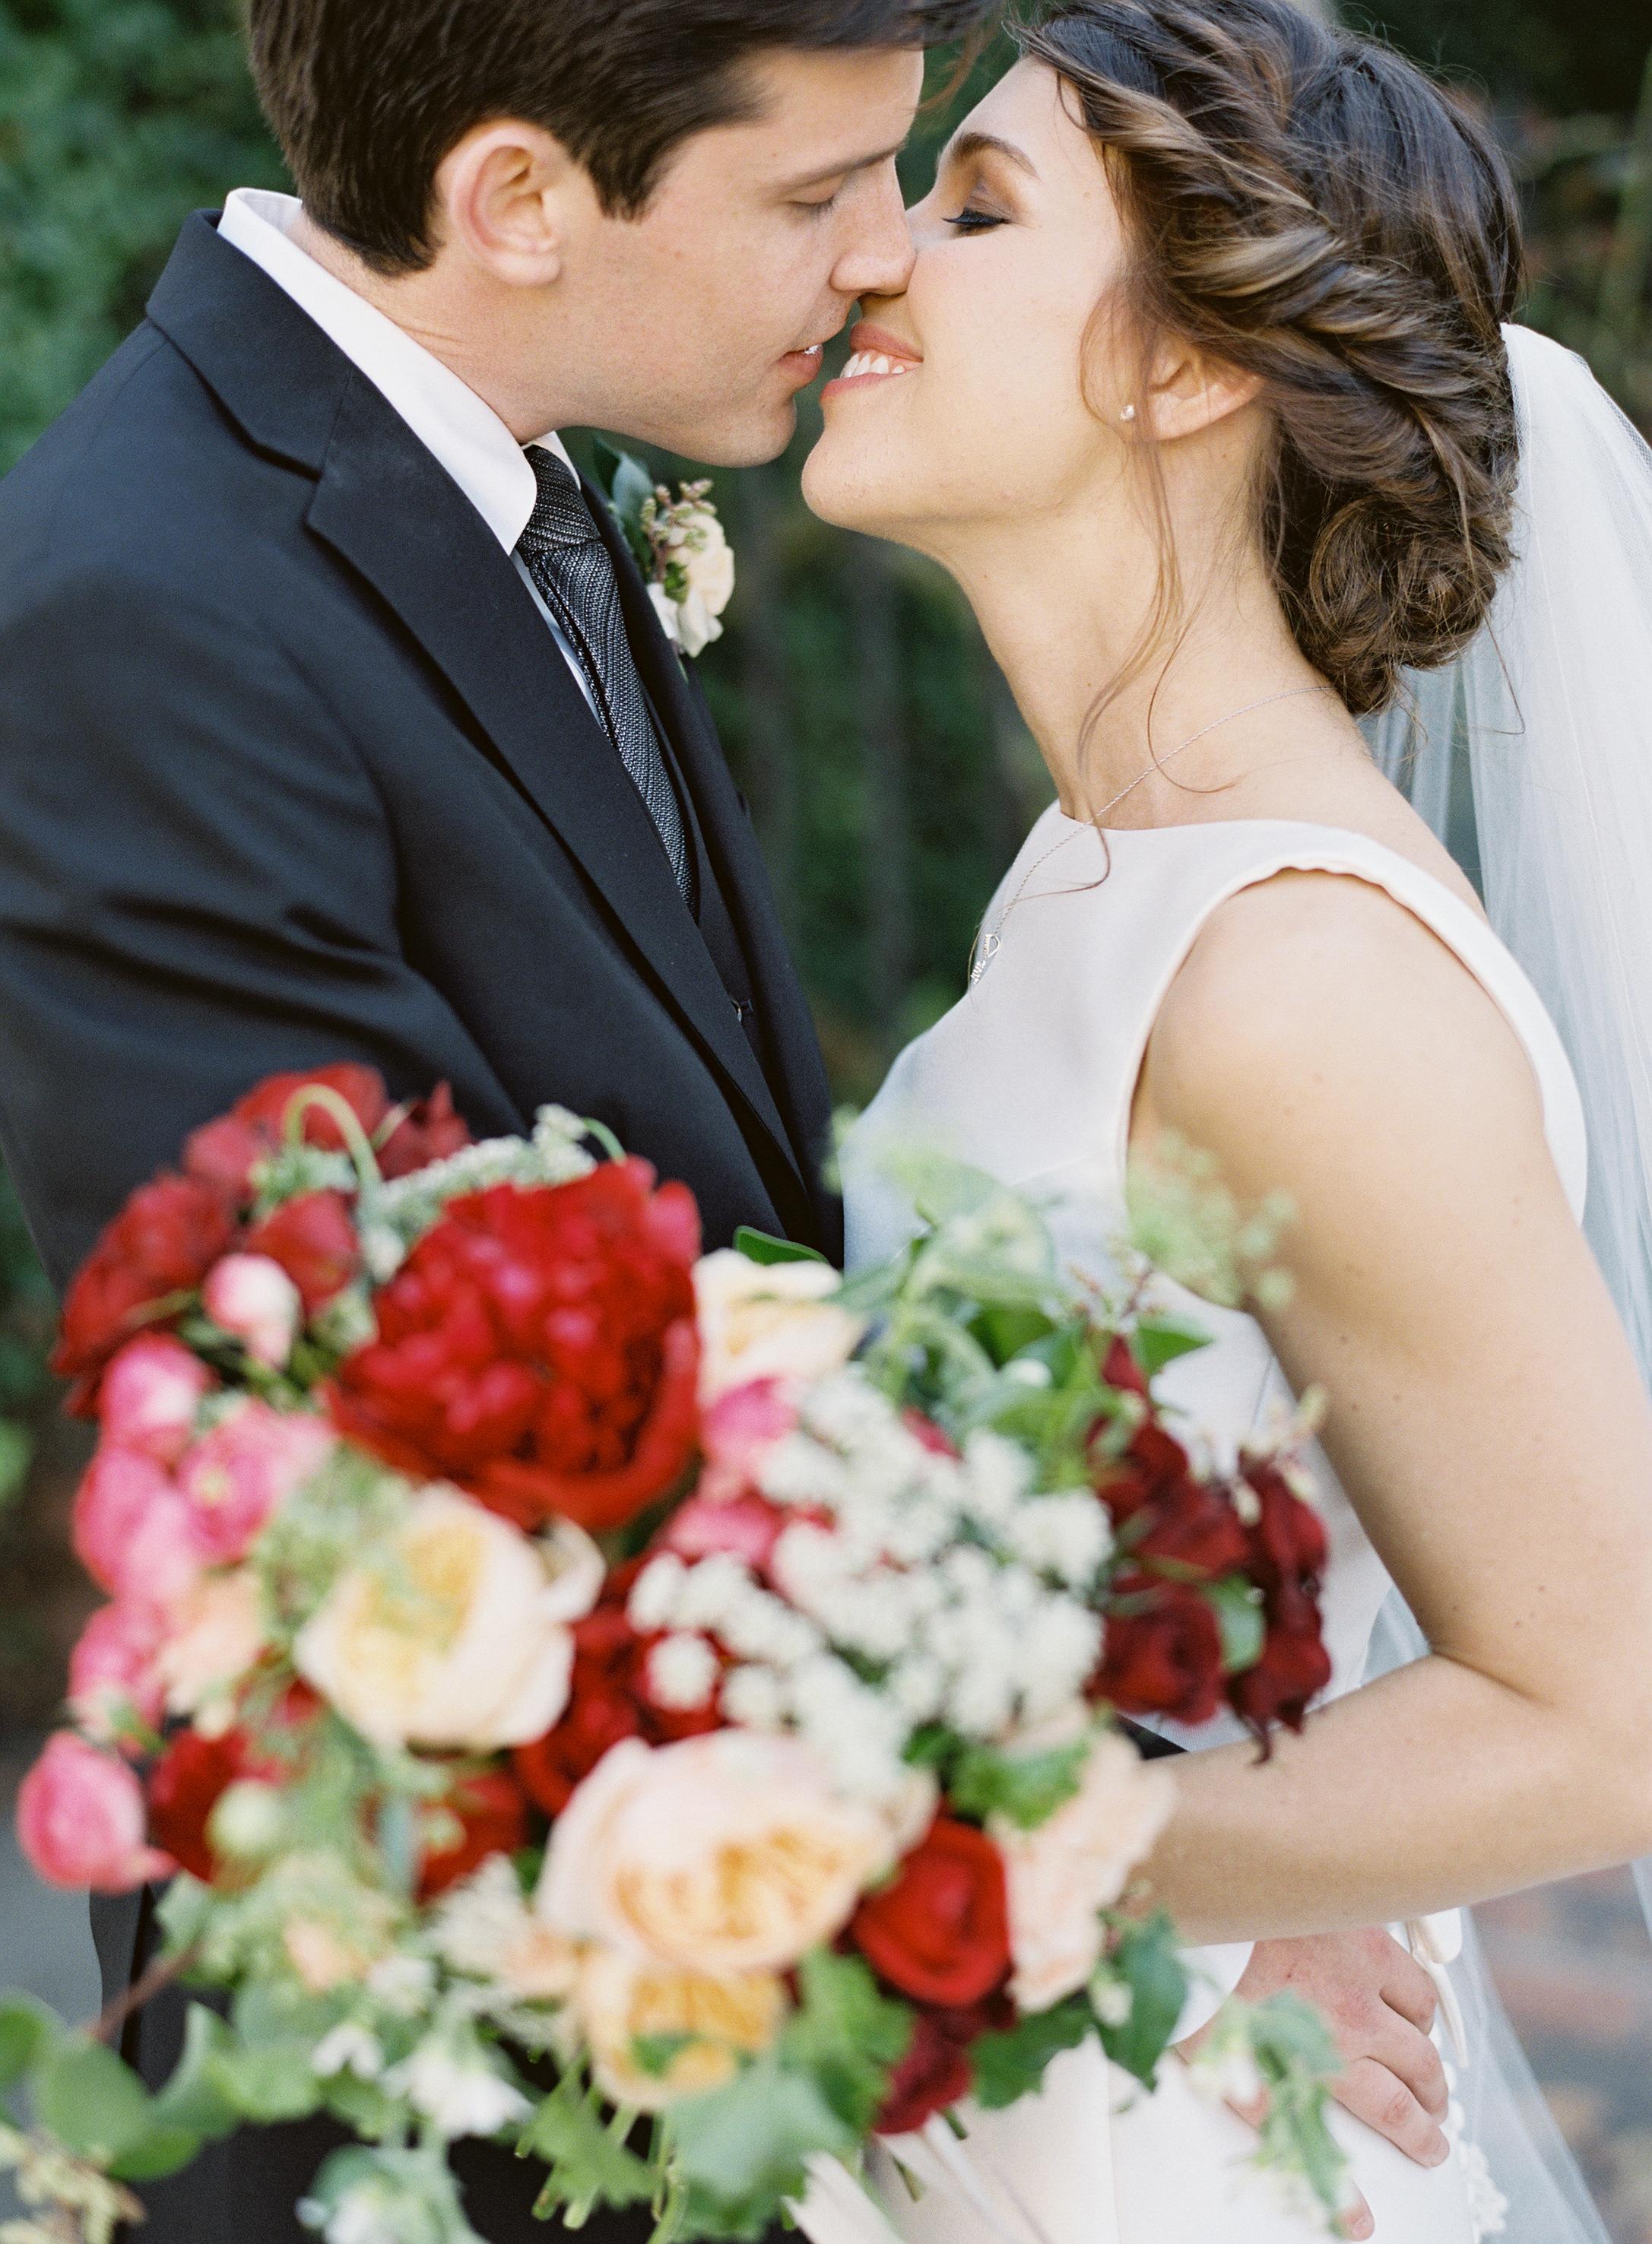 Meghan Mehan Photography - California Wedding Photographer | San Francisco City Hall Wedding 053.jpg